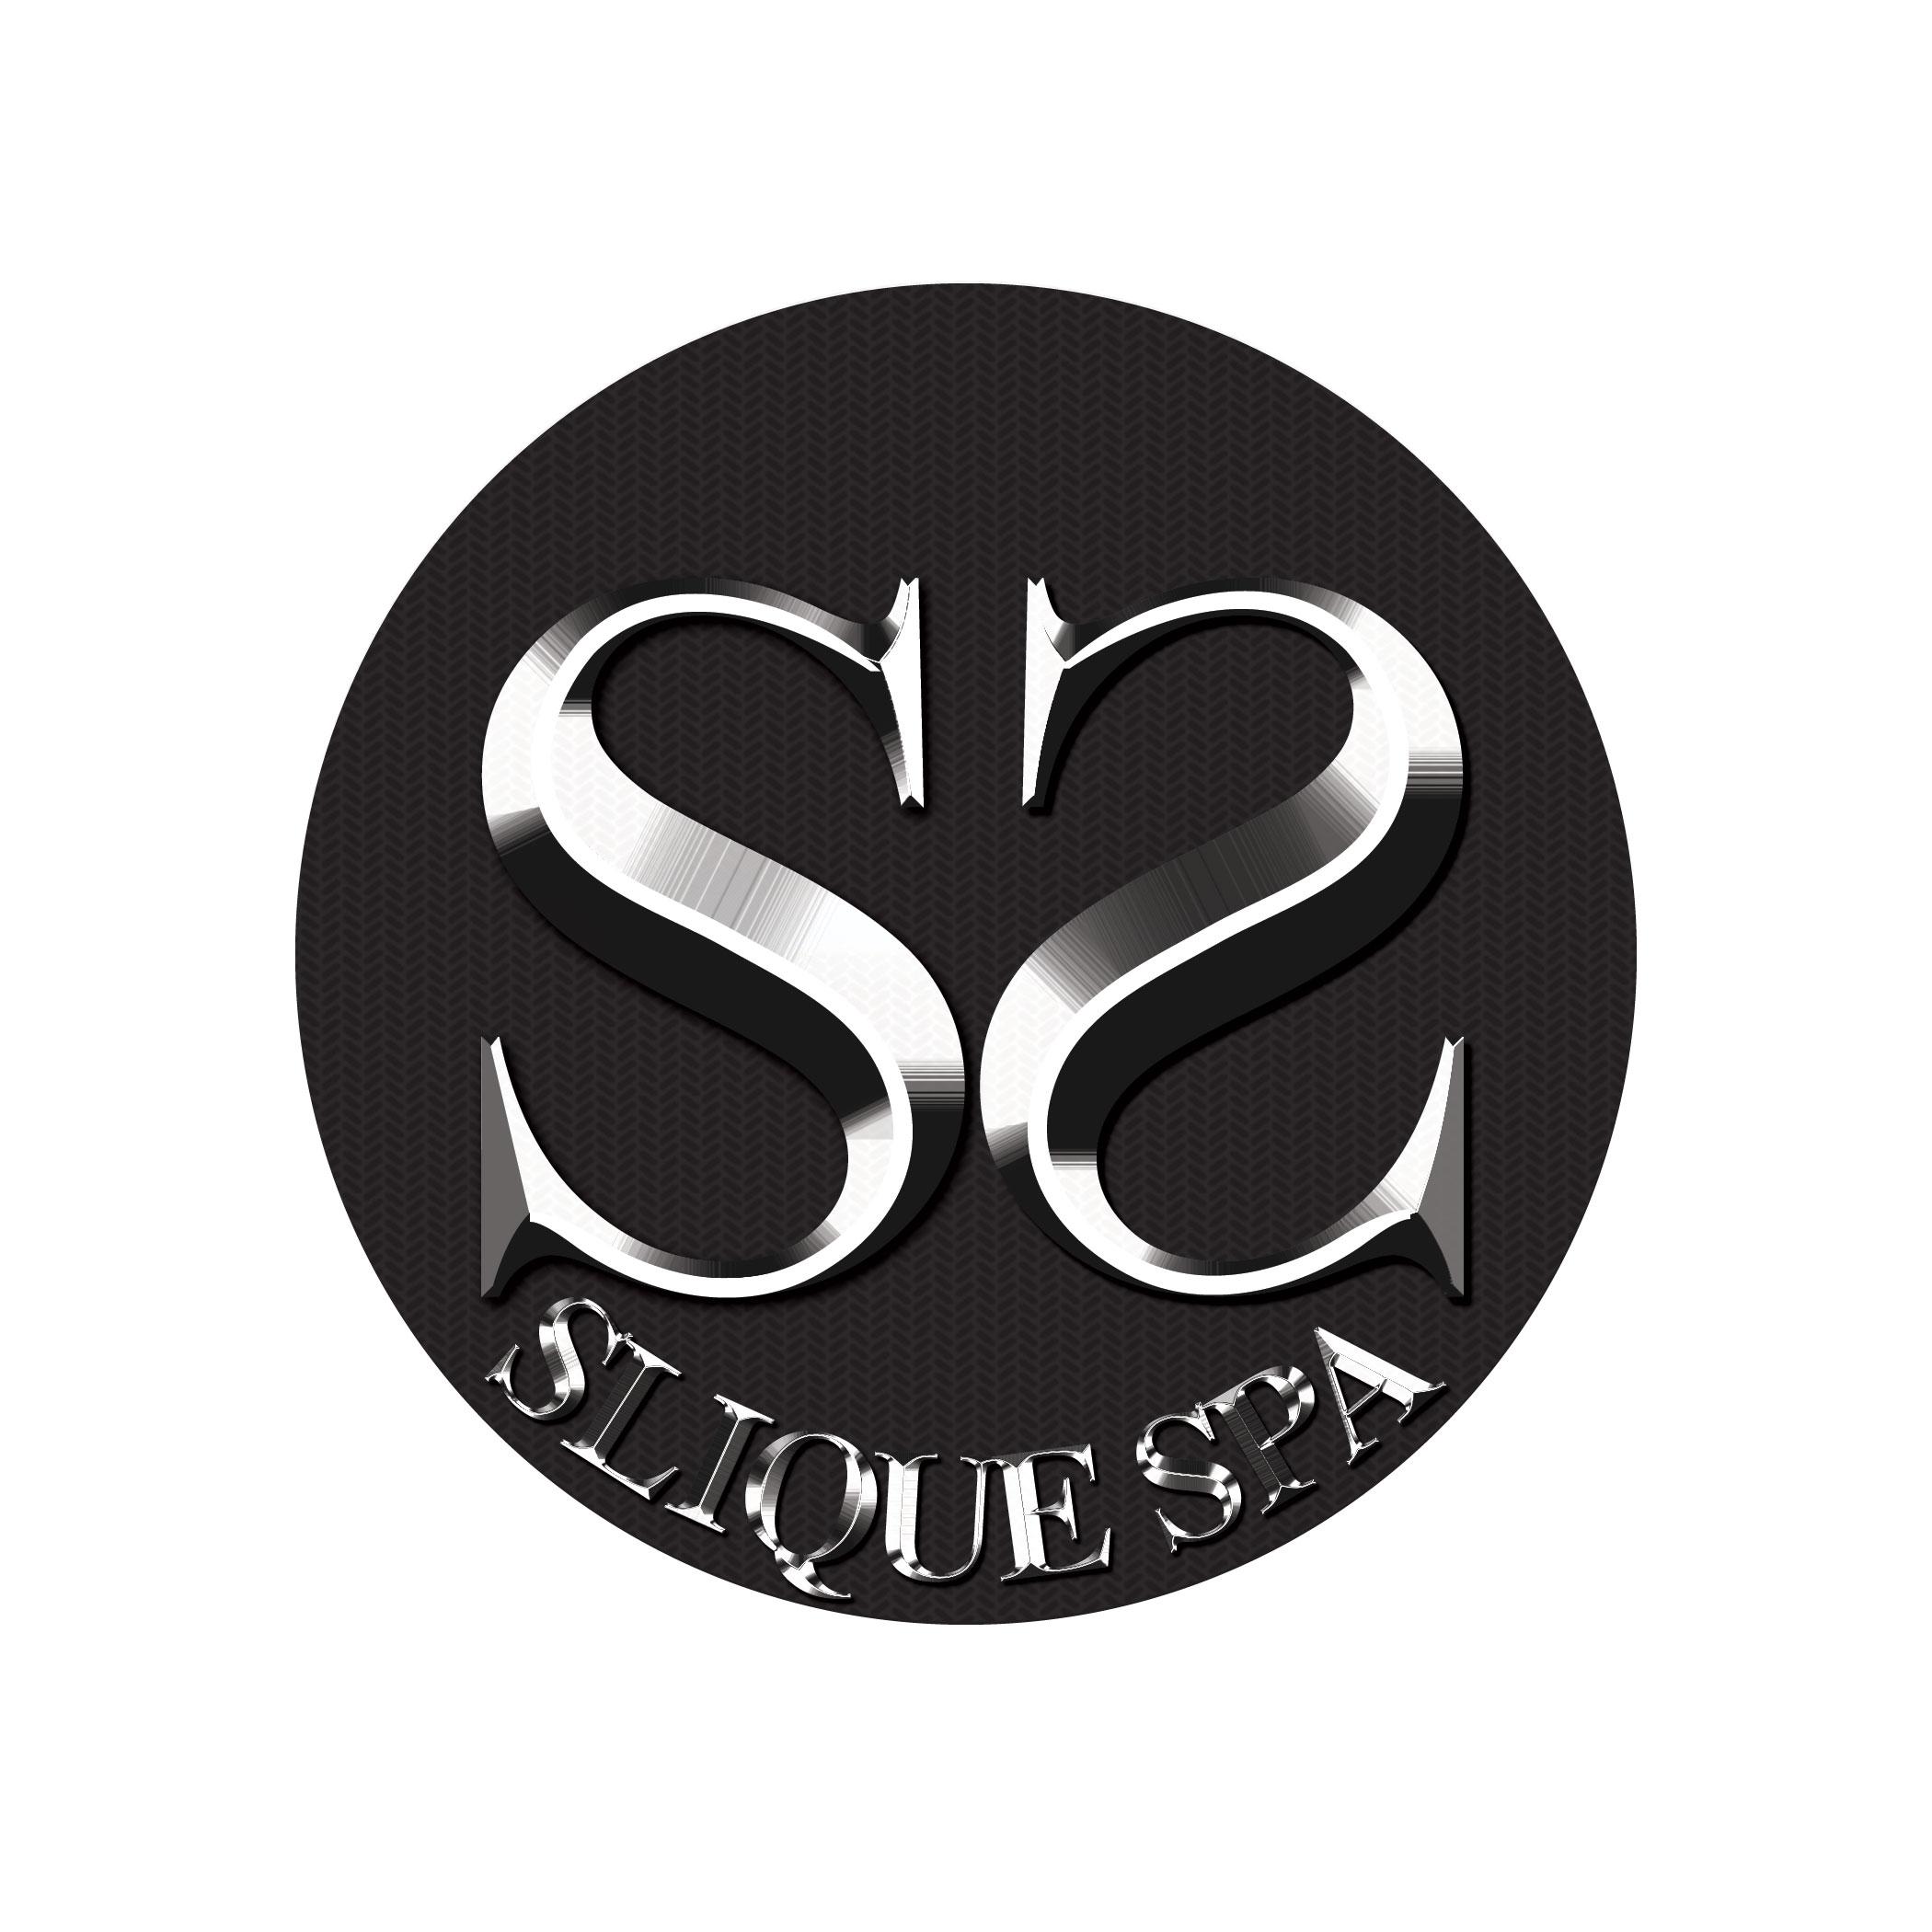 Slique Spa London